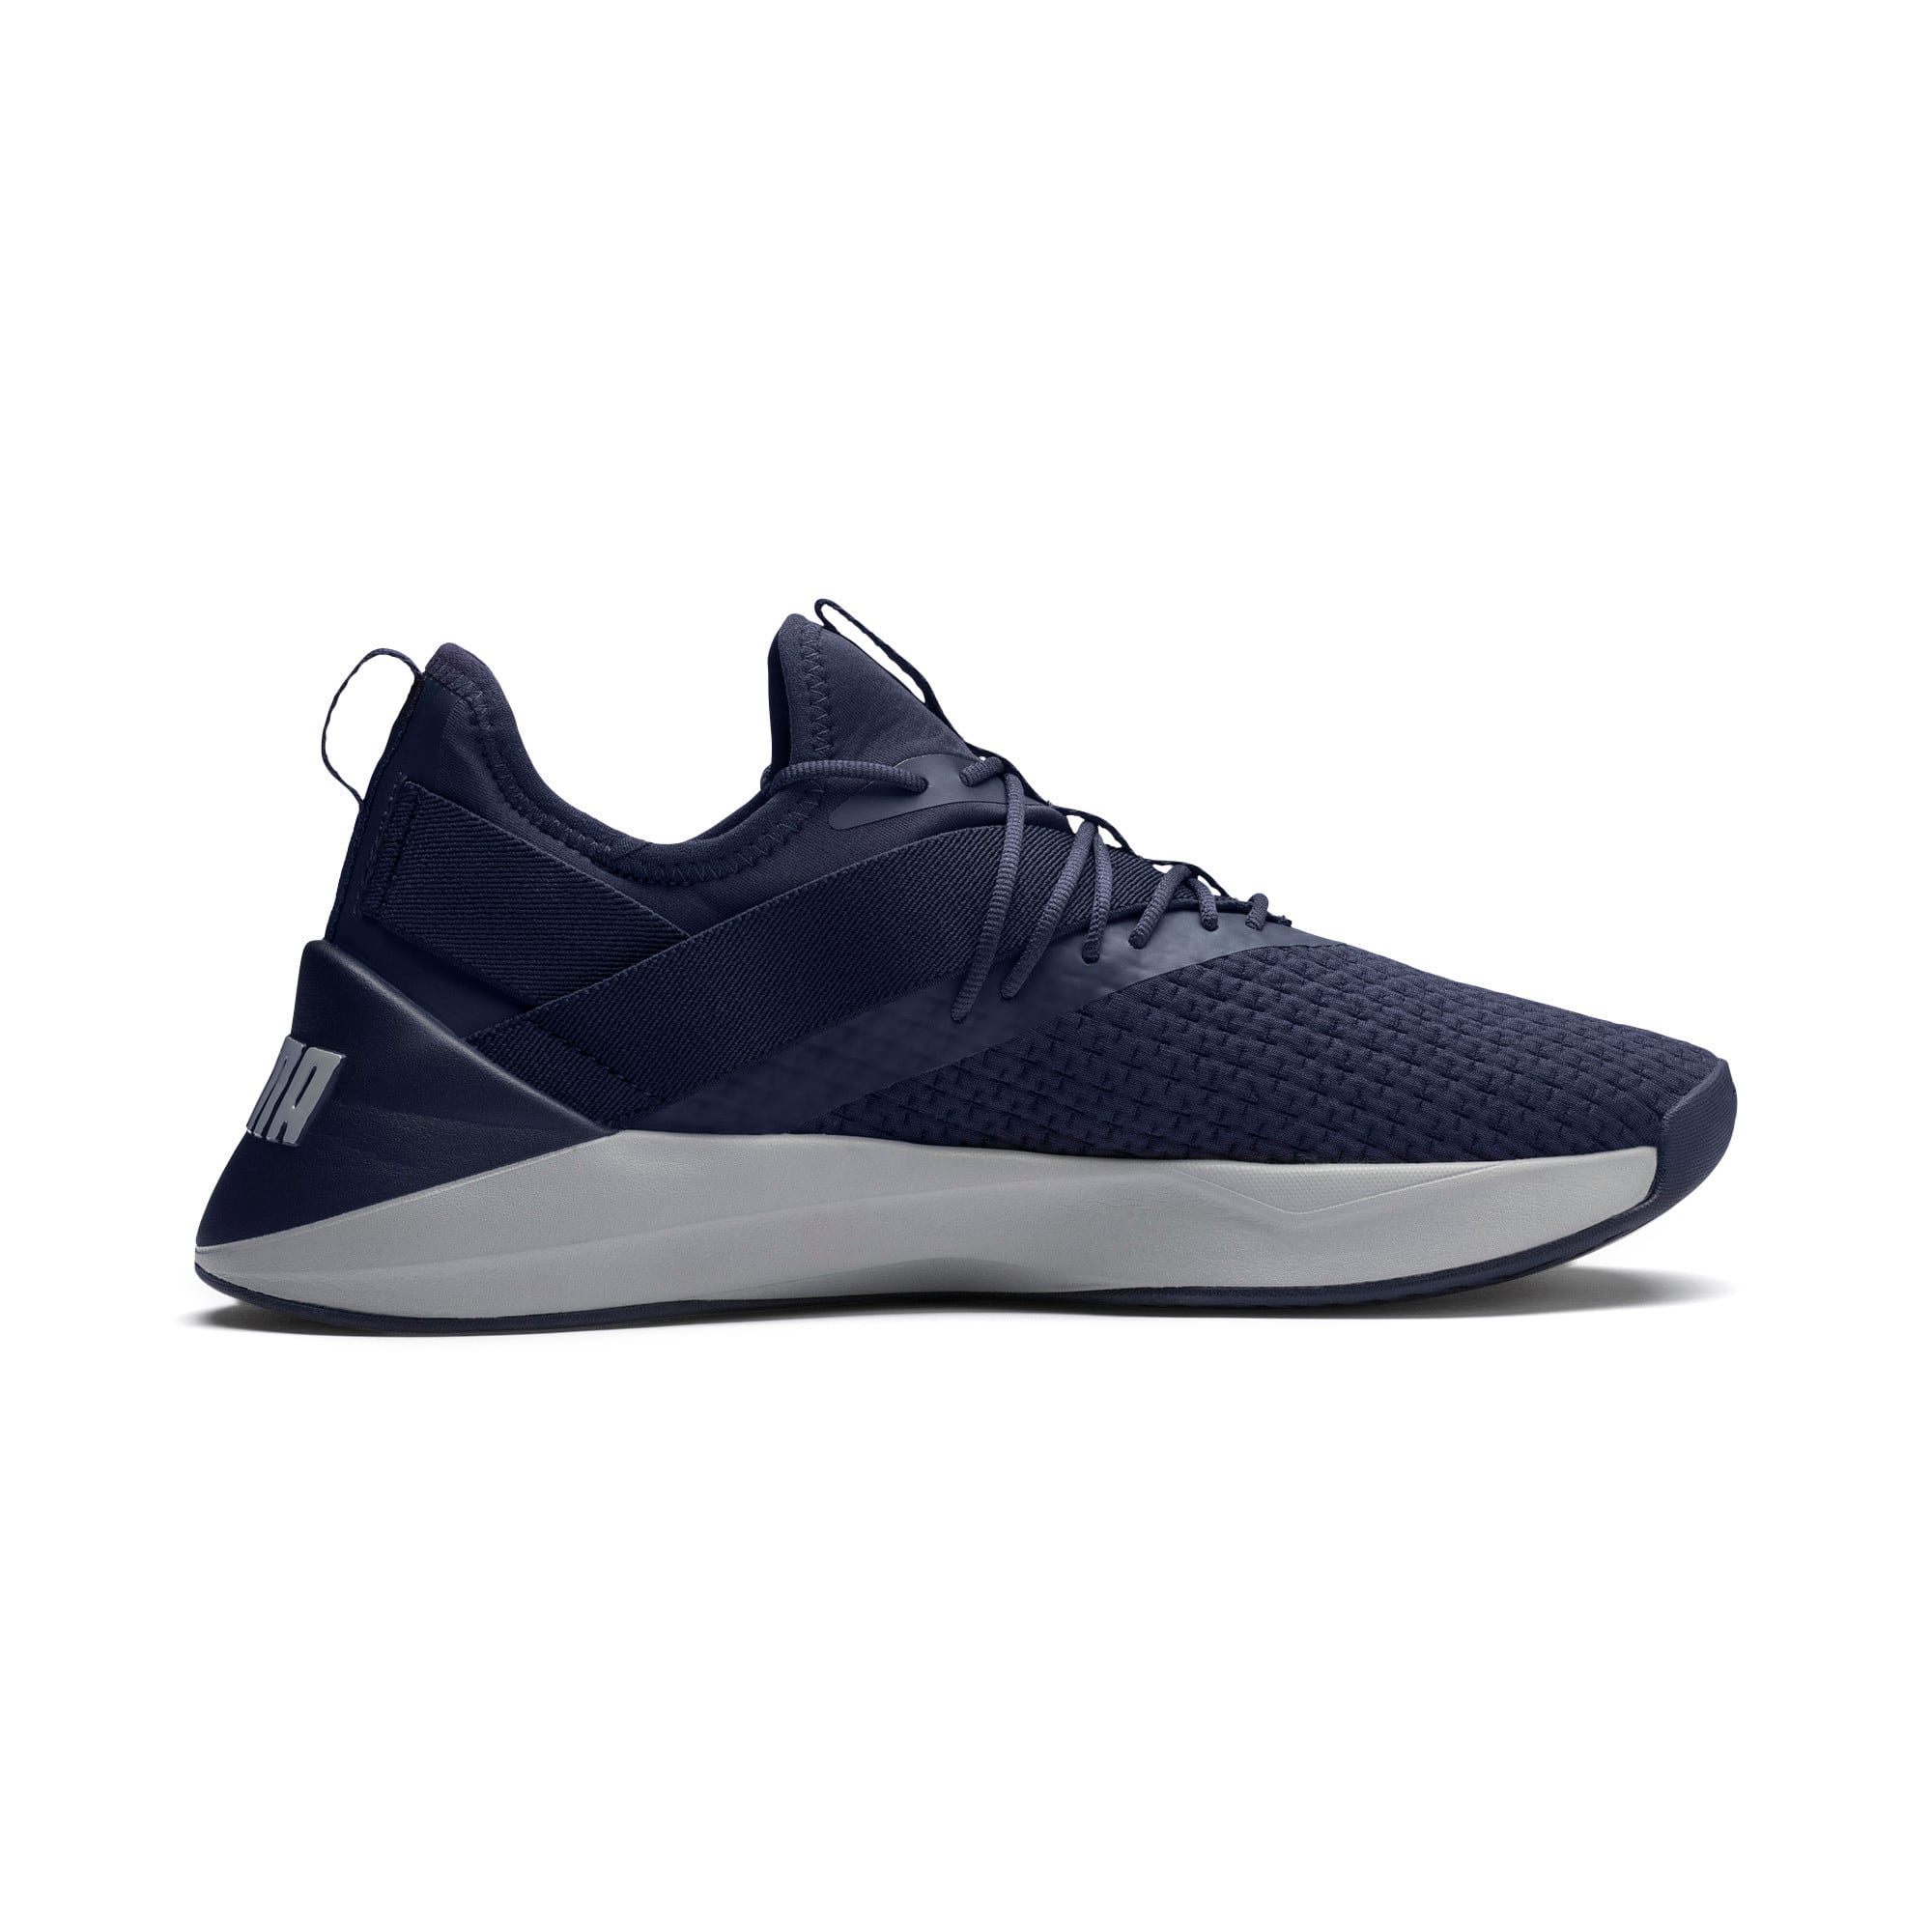 Thumbnail 5 of Jaab XT Men's Training Shoes, Peacoat-Quarry, medium